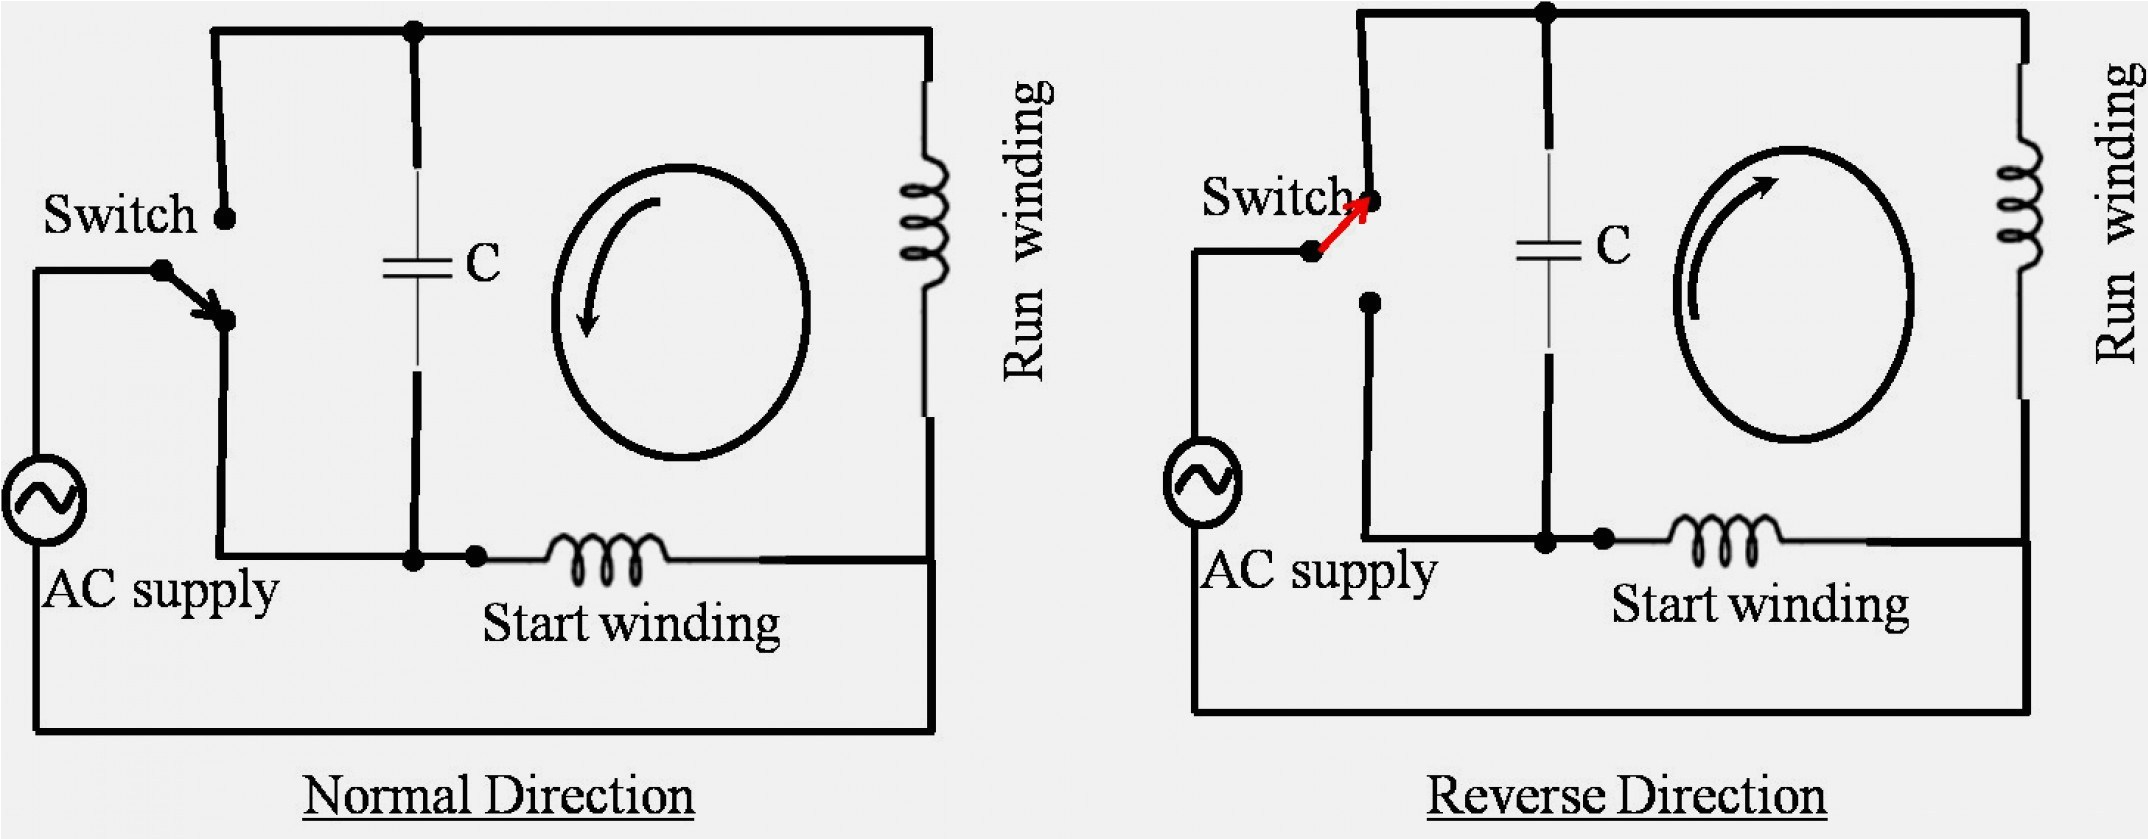 single phase electrical motor winding diagram download wiring wiring diagram induction motor single phase free download wiring